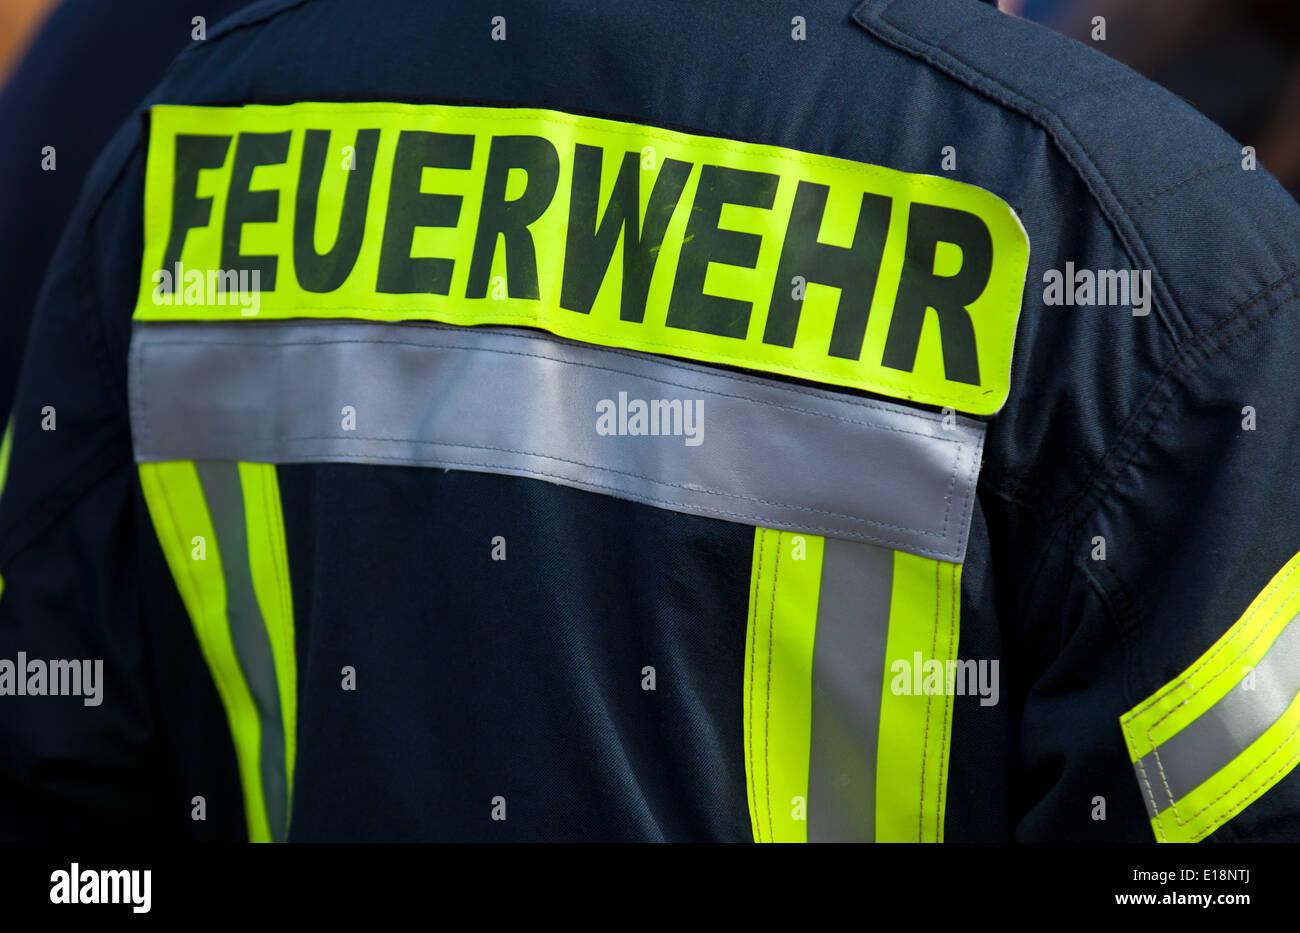 German firefighter - Stock Image